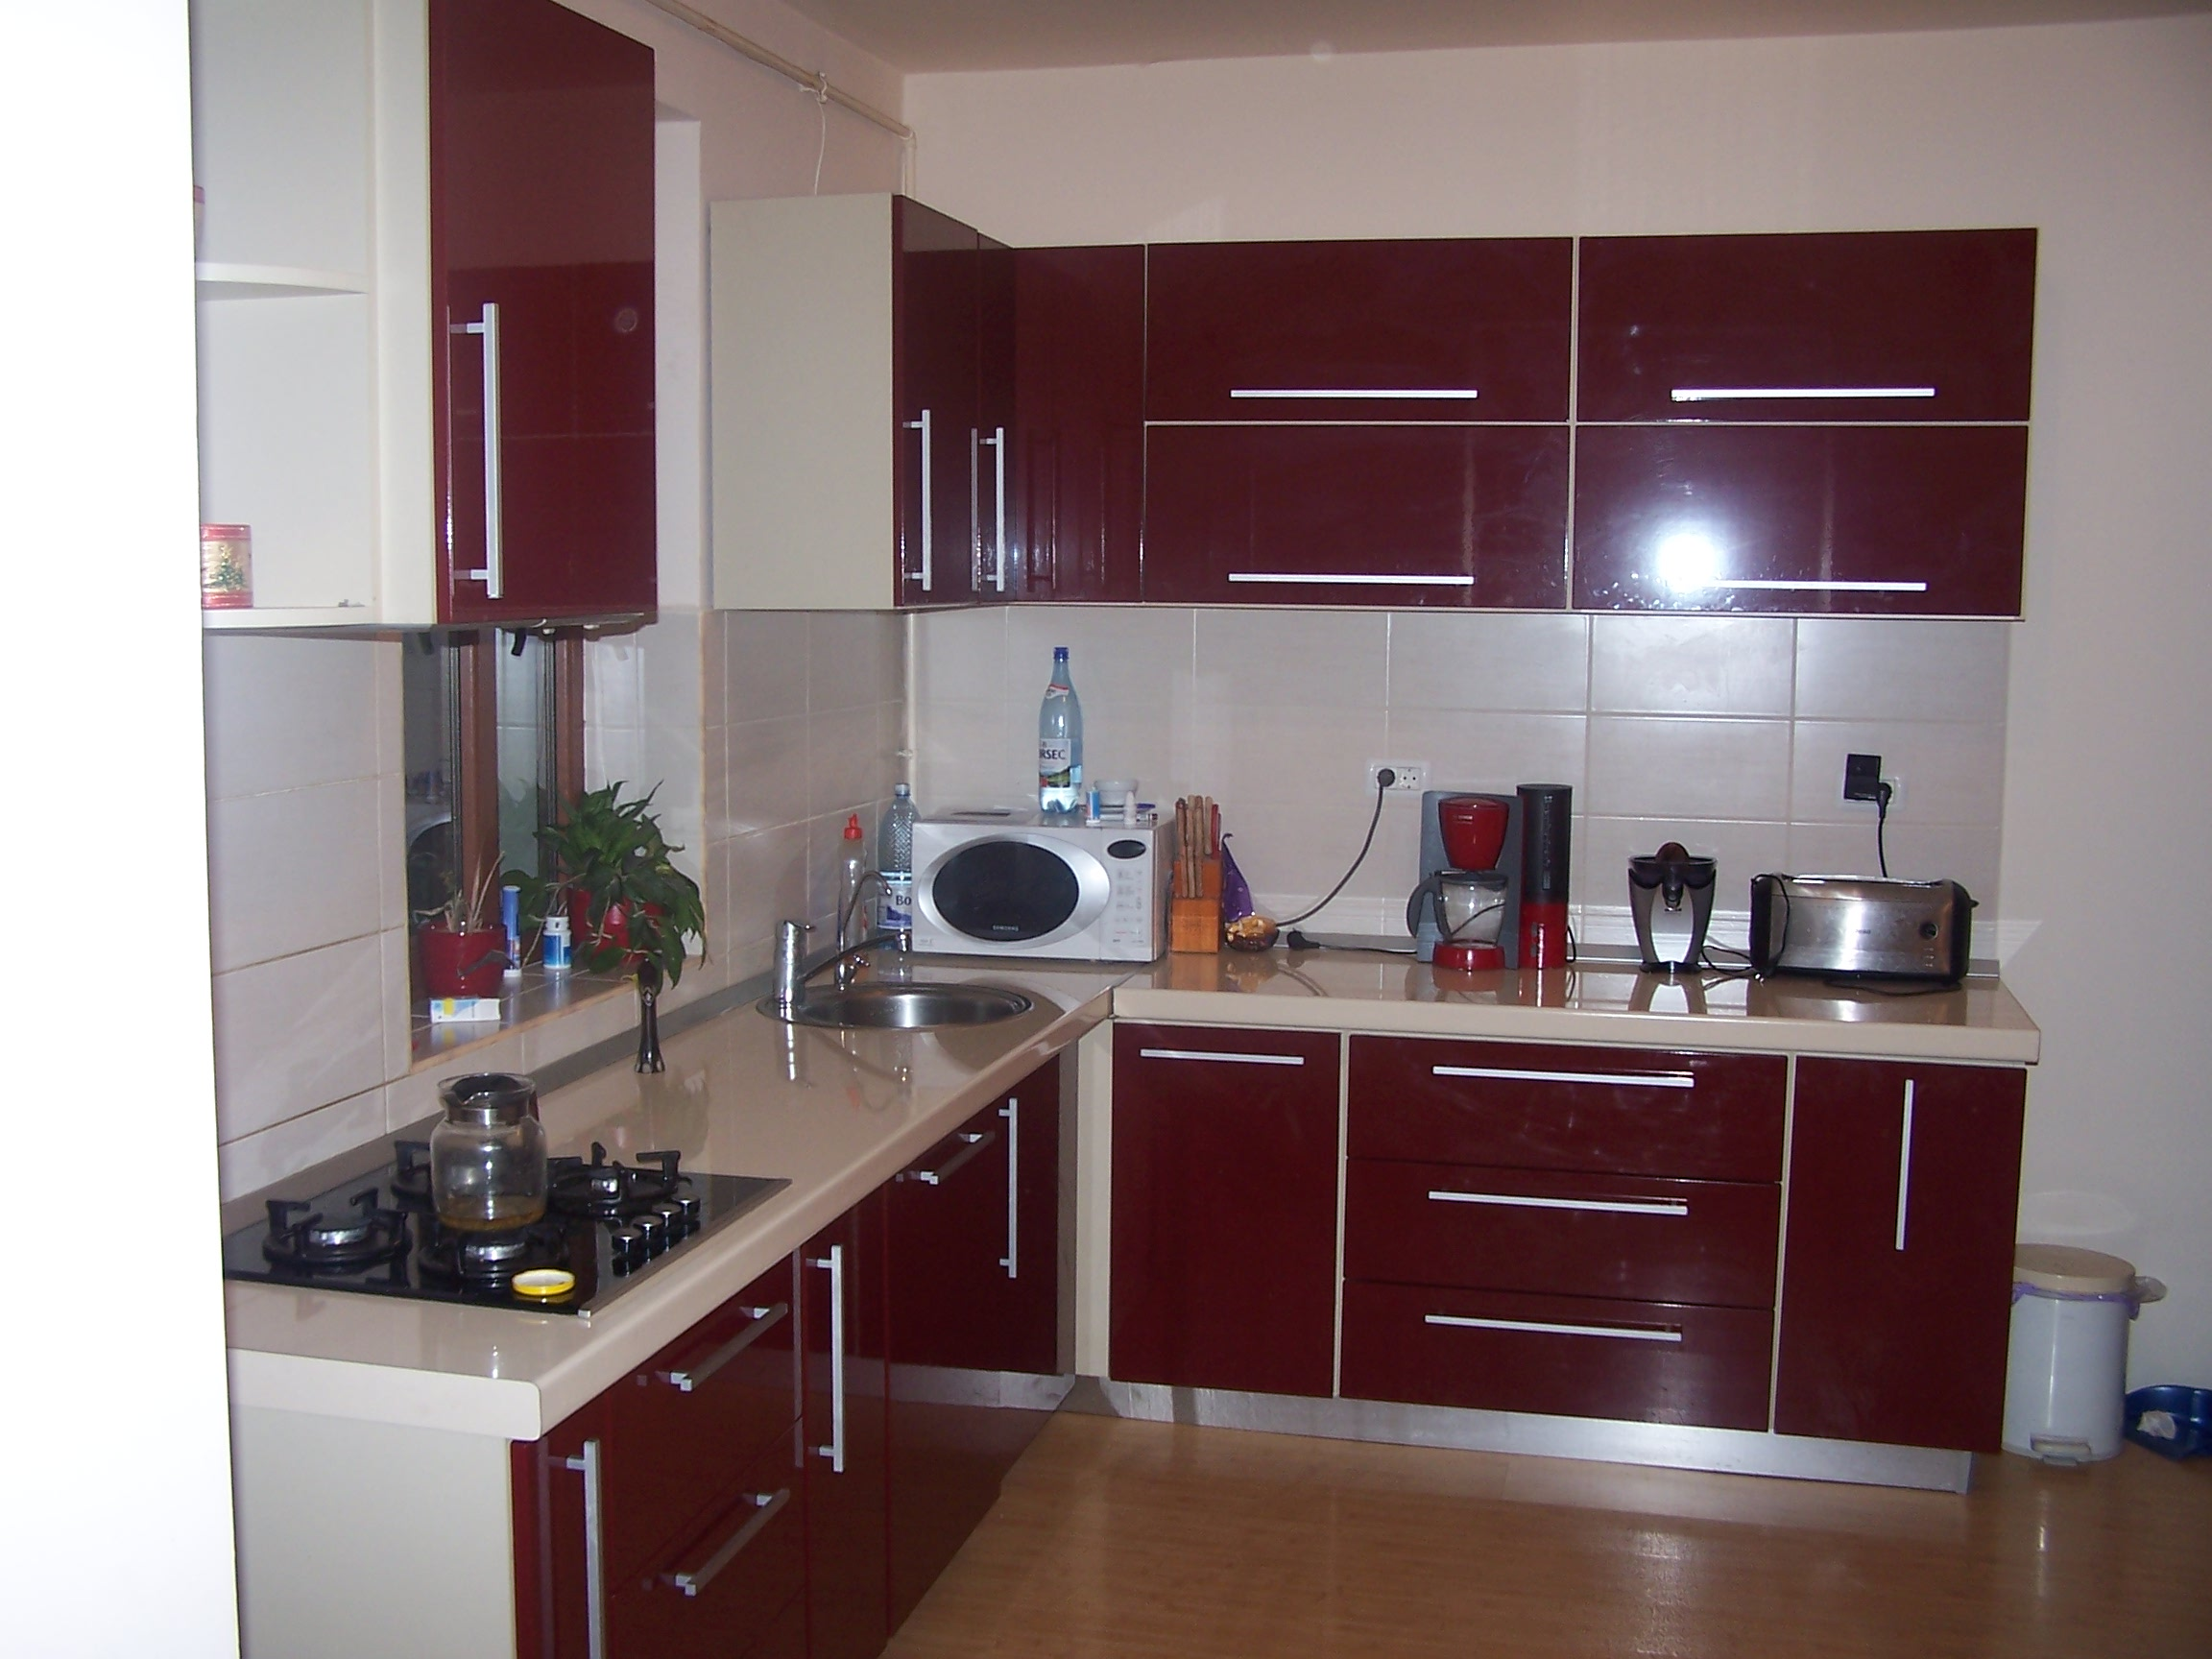 mobilier bucatarie mobilier bucatarie. Black Bedroom Furniture Sets. Home Design Ideas